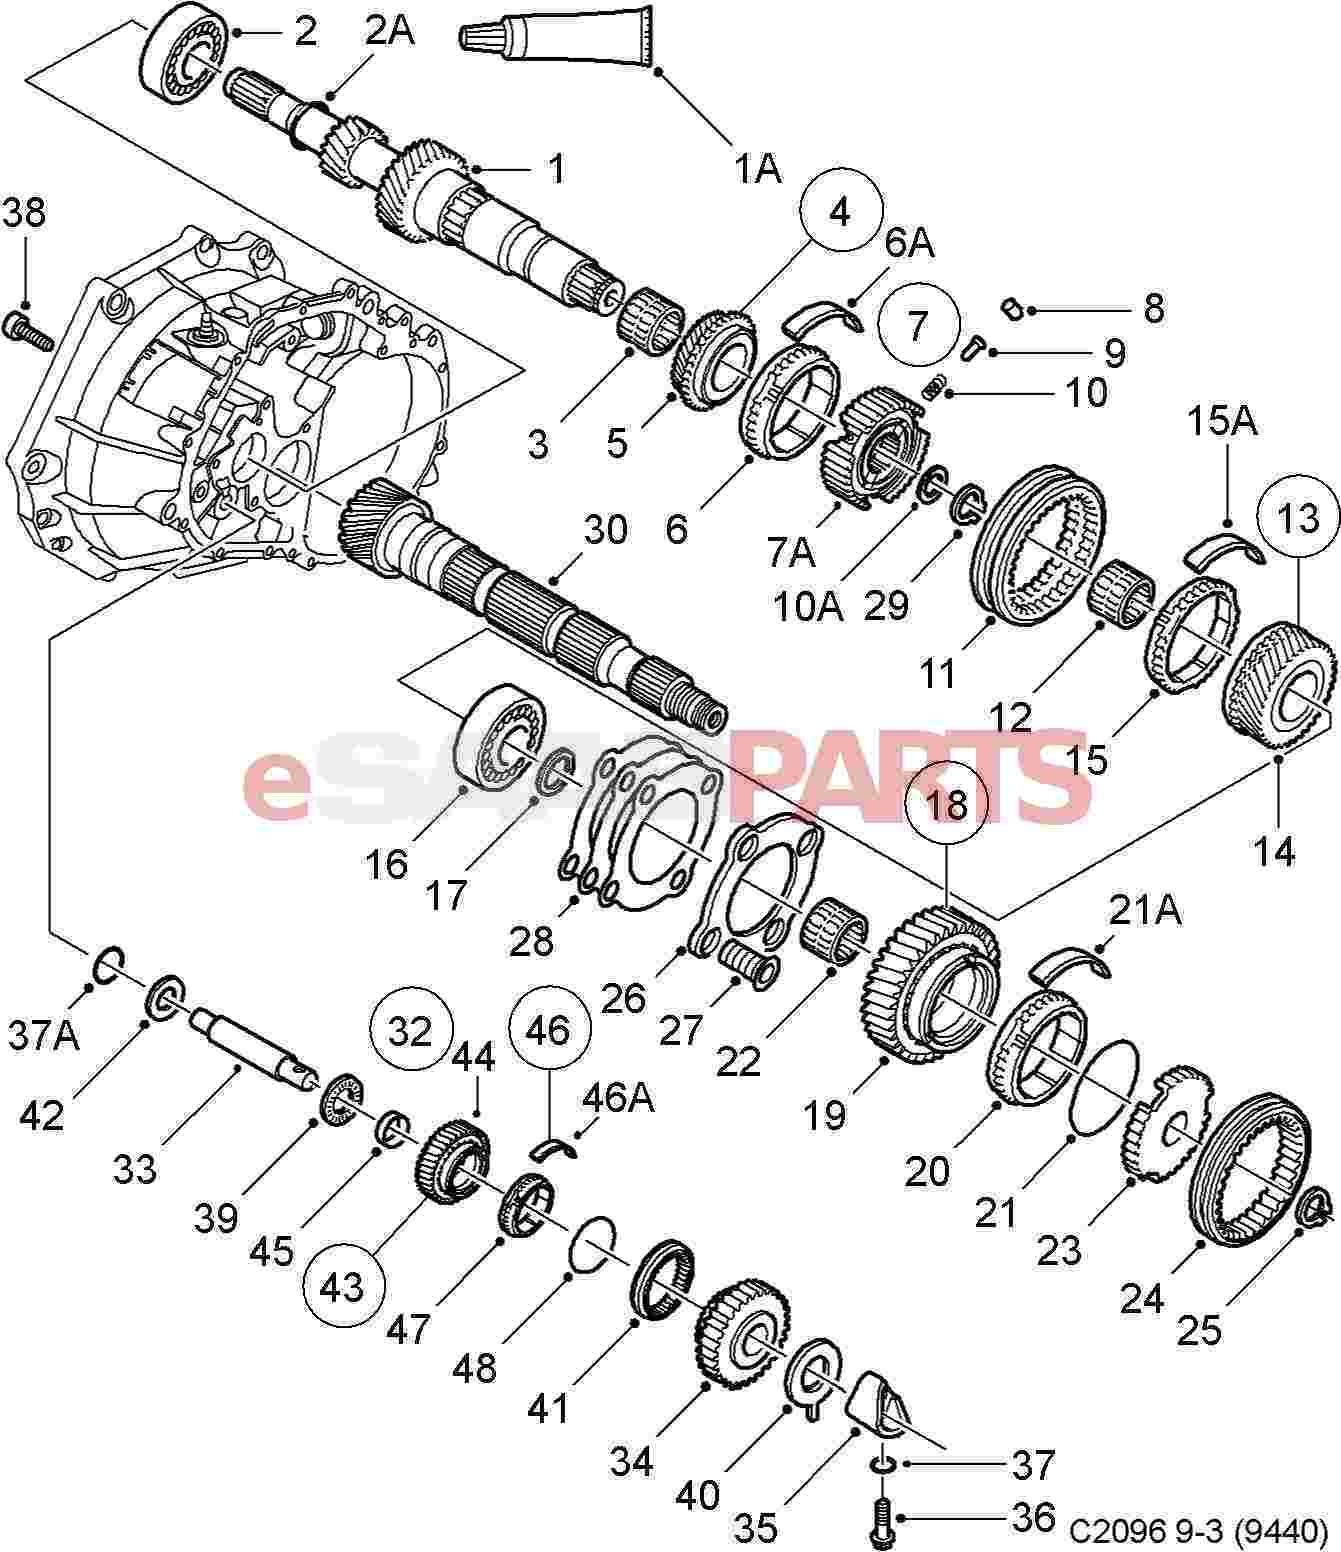 Esaabparts saab 9 3 9440 > transmission parts > transmission manual > shafts gears input shaft